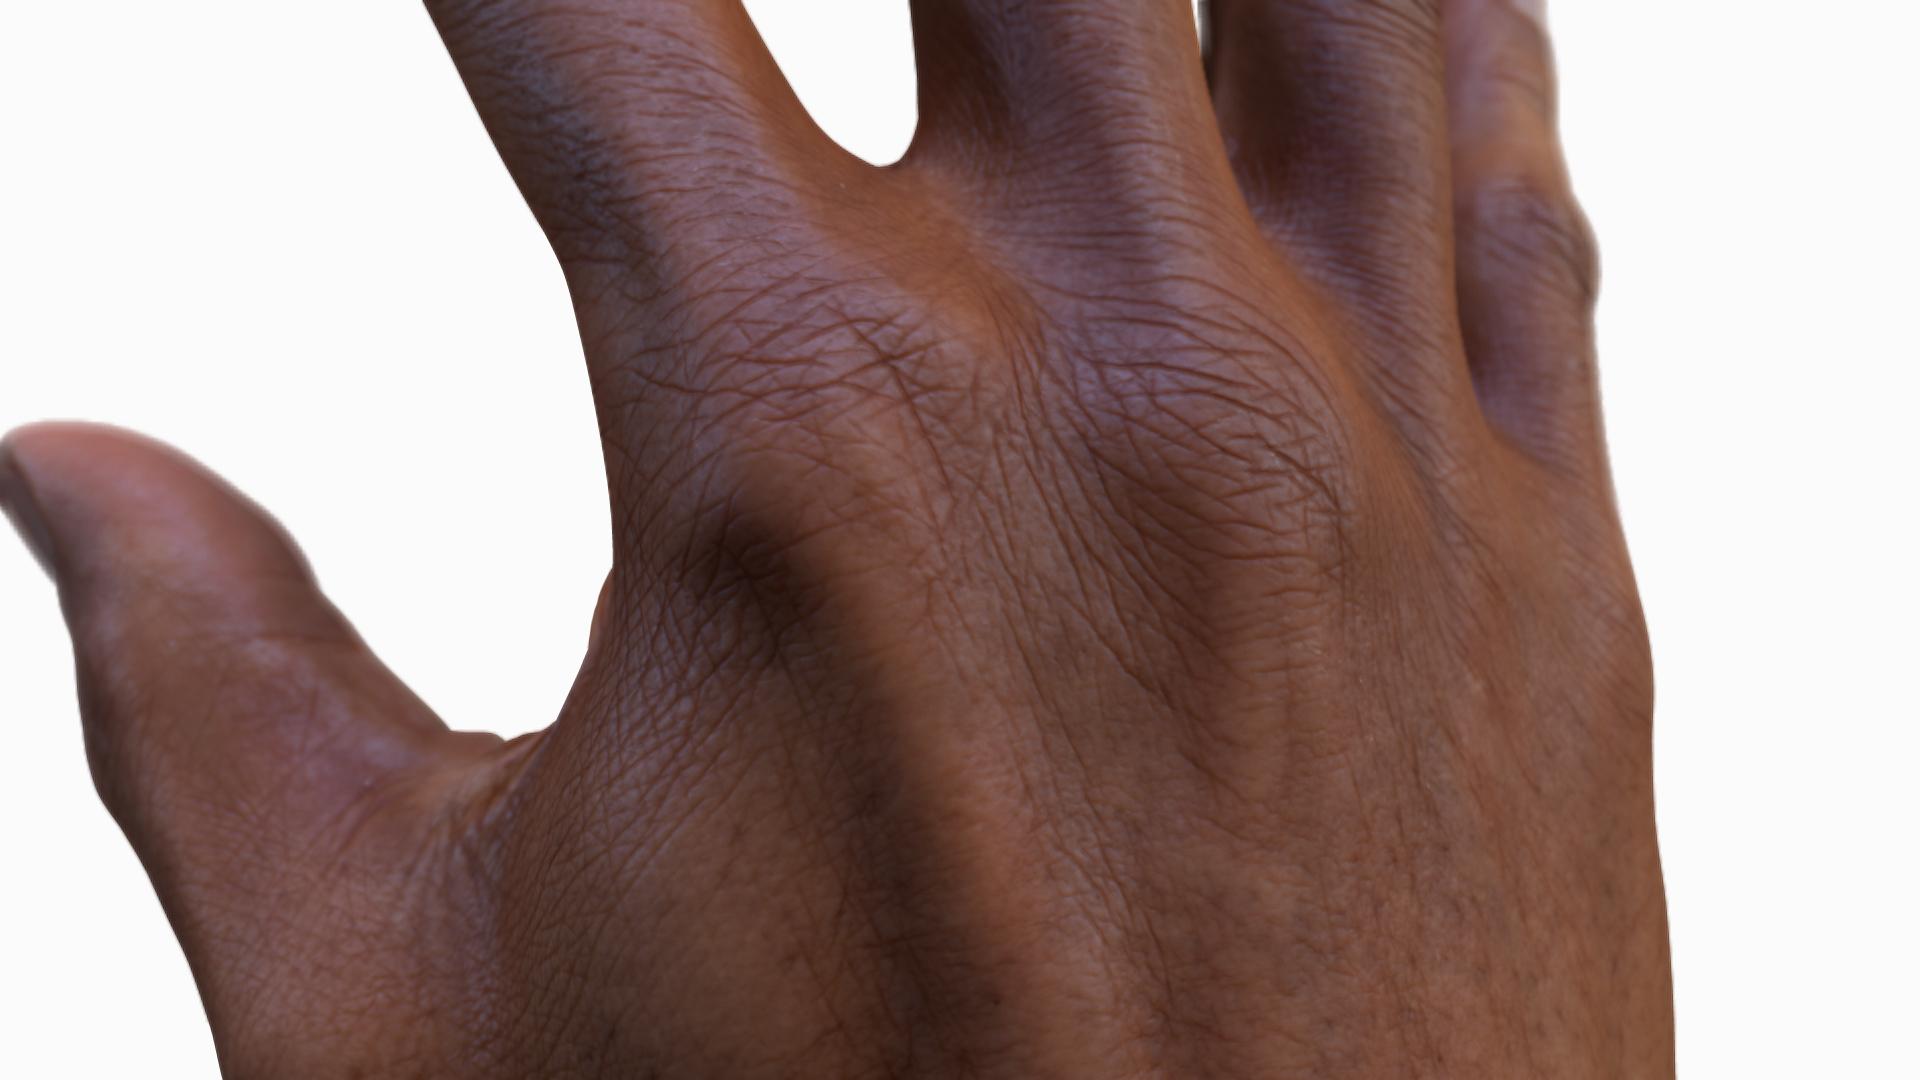 3D Man Hands Model Download